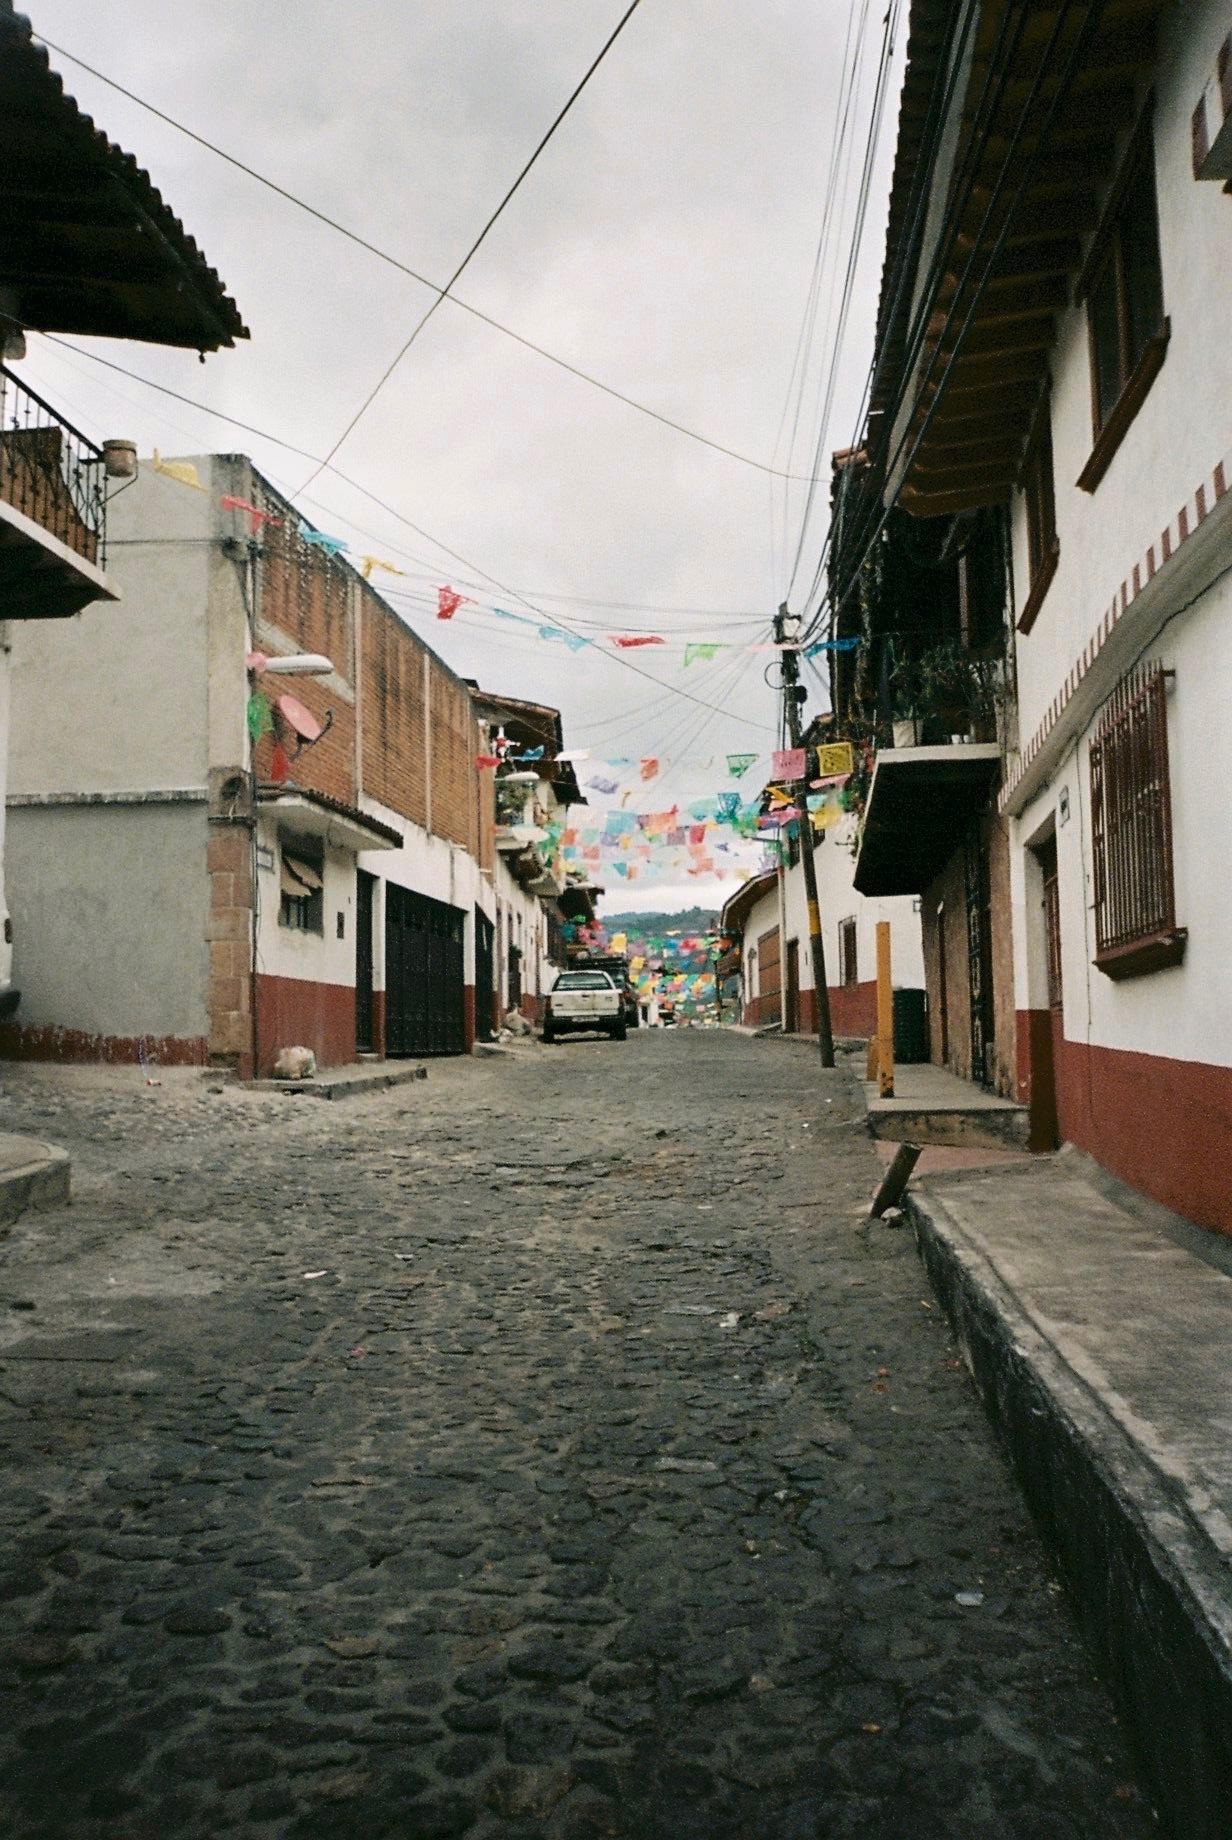 Valle De Bravo 01-2020 - 28 of 51